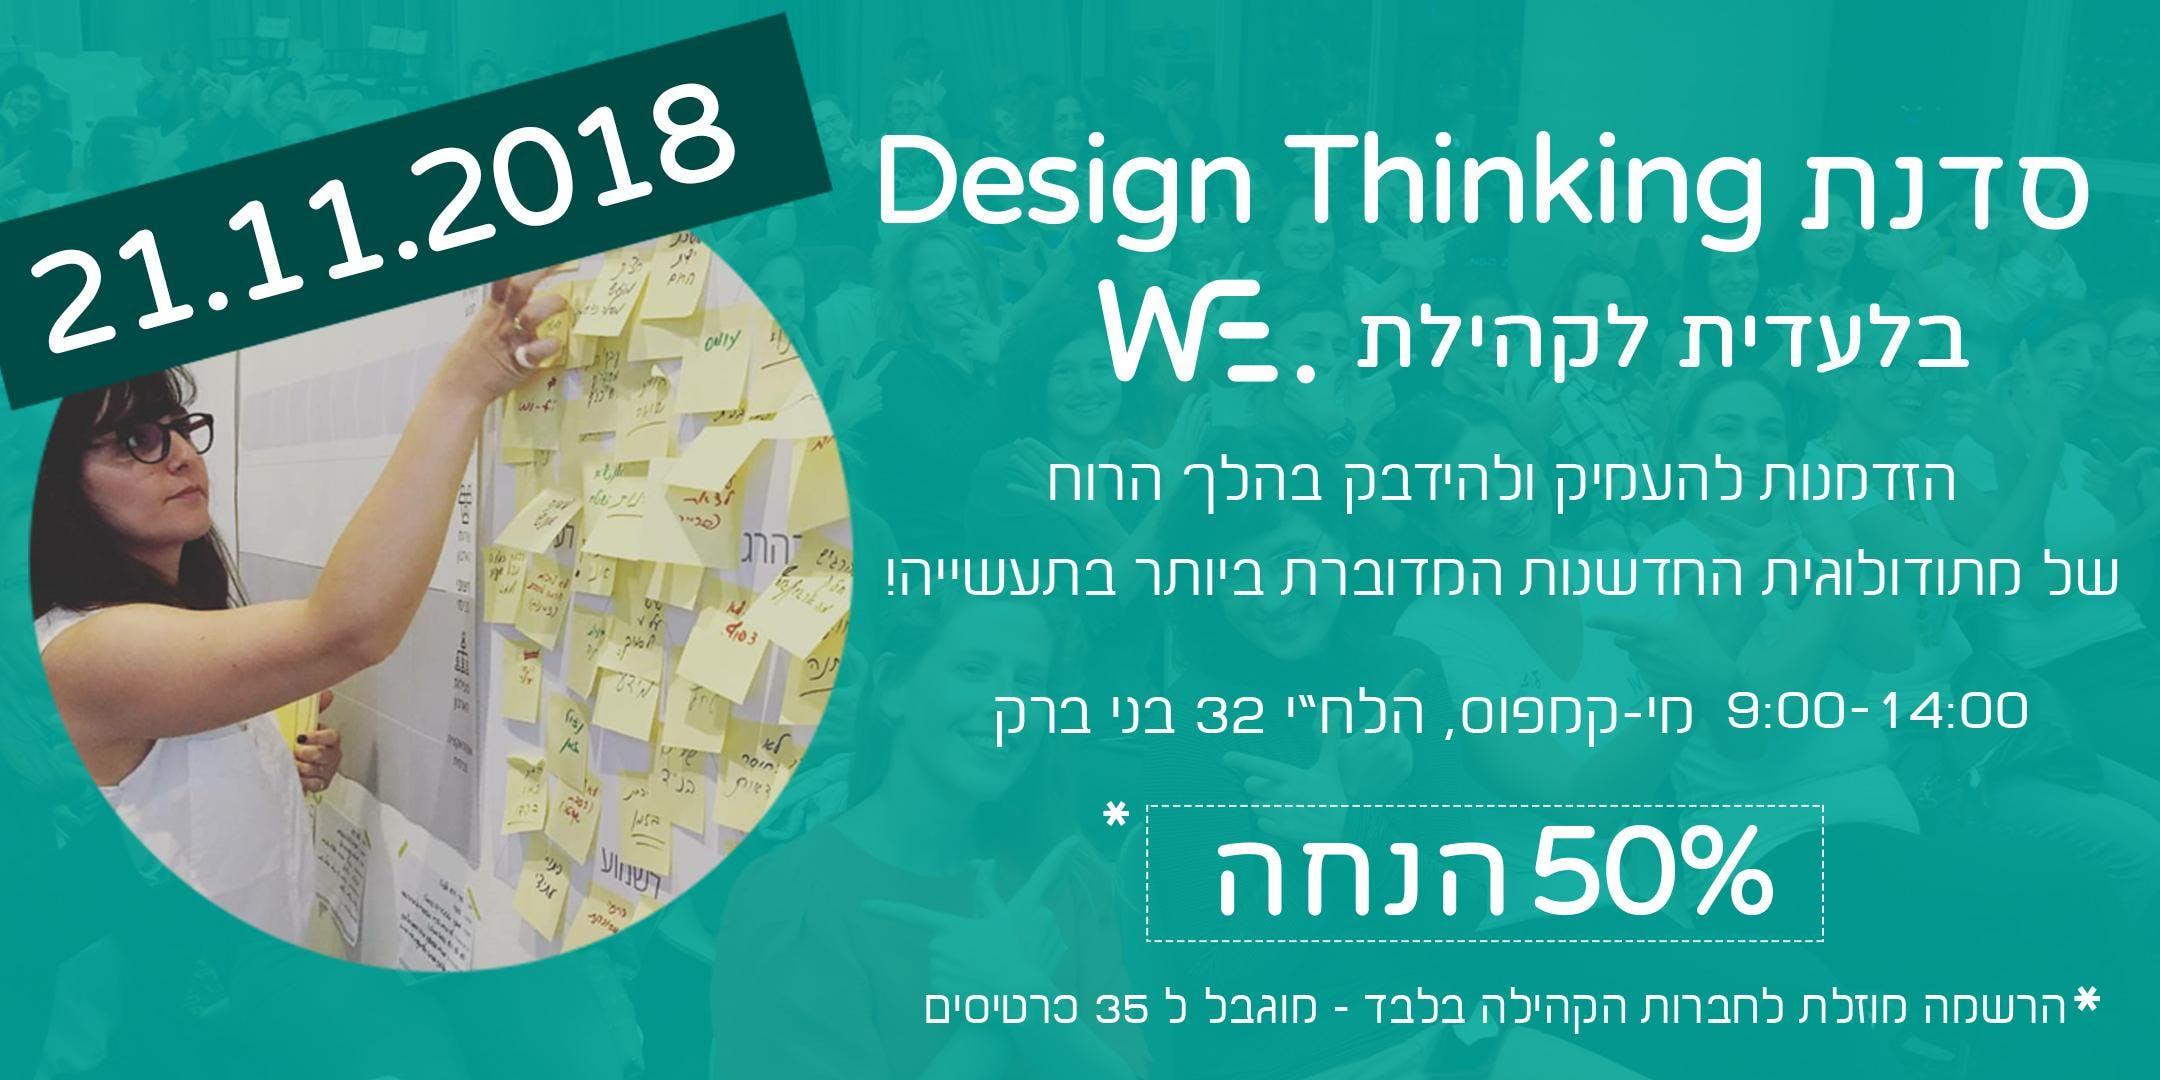 !WE בלעדית לקהילת - Design Thinking סדנת